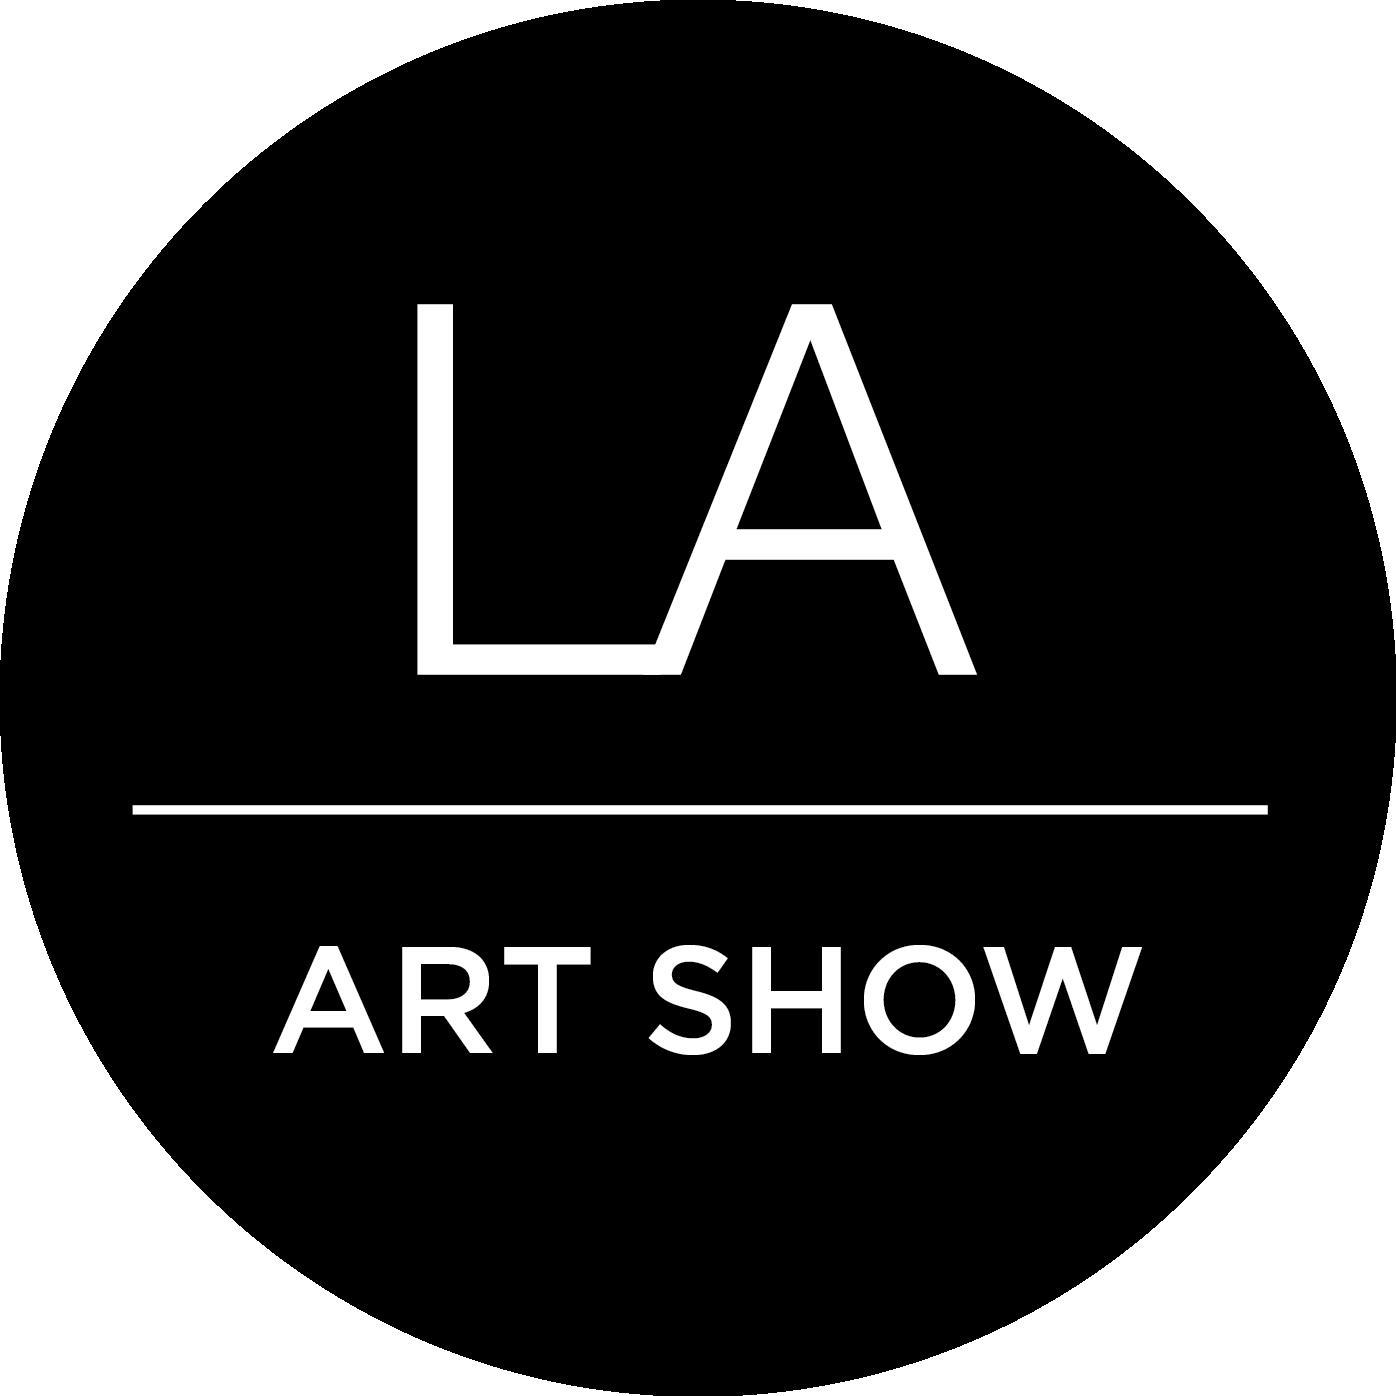 LA ART SHOW OPENING NIGHT